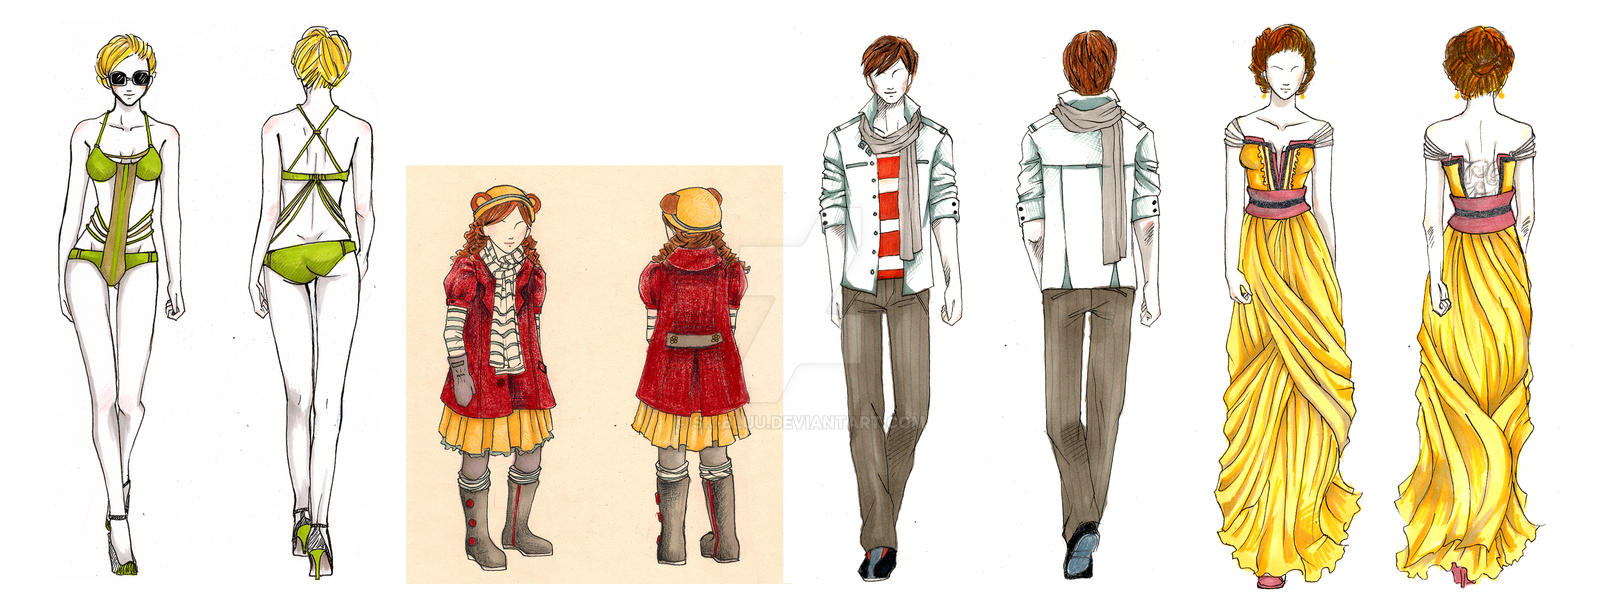 Ryerson Fashion Portfolio By Sk Bluu On Deviantart